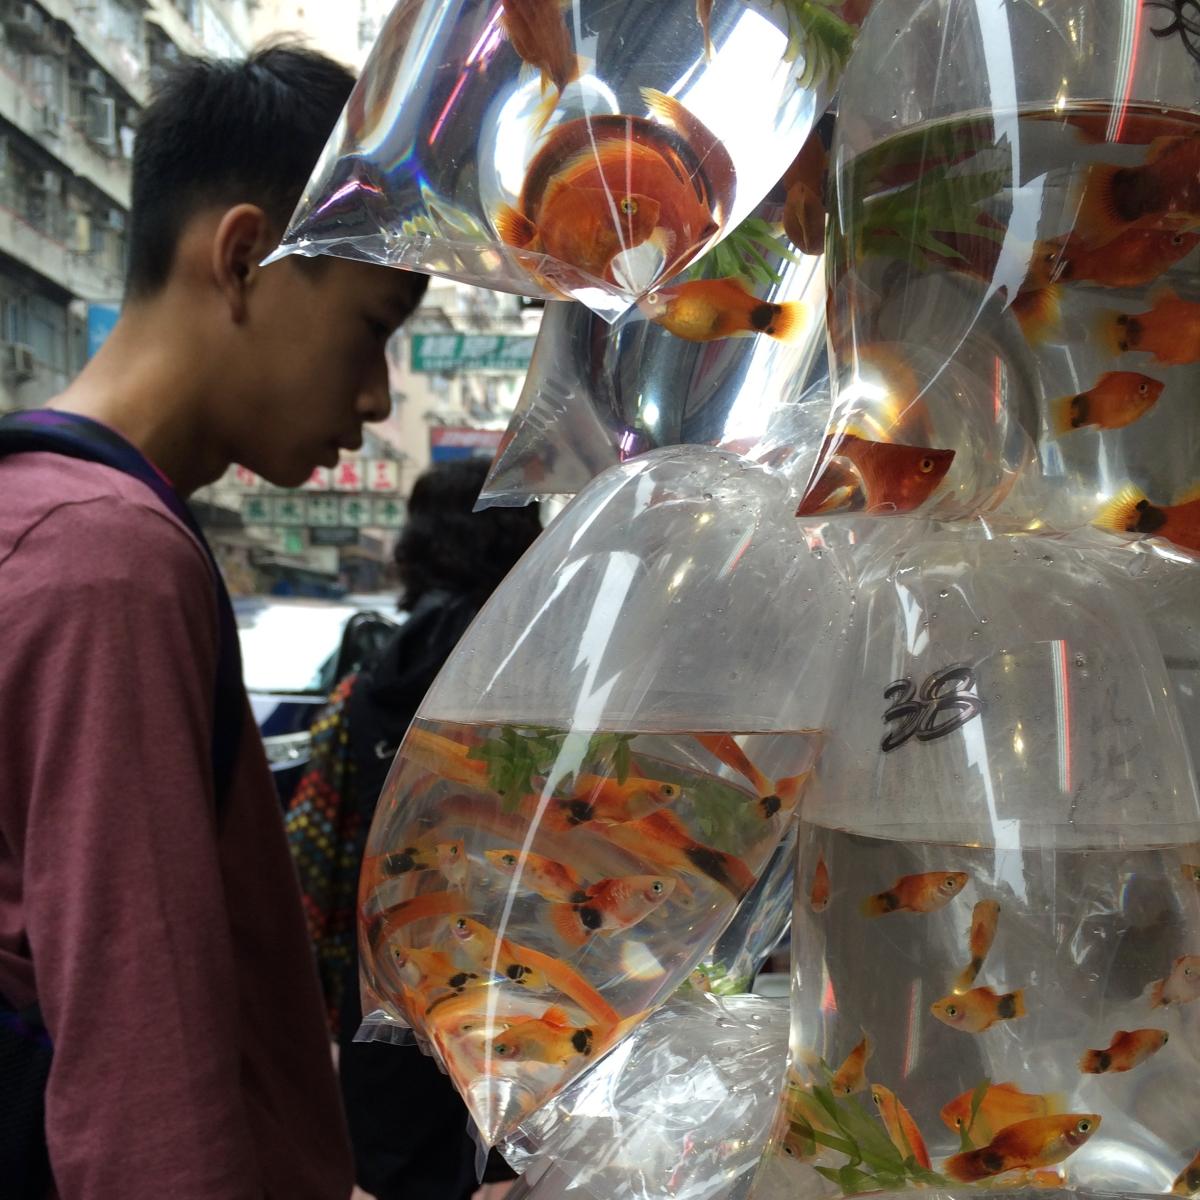 Kowloon, Hong Kong | A Walking Tour through the Colourful Markets ofKowloon